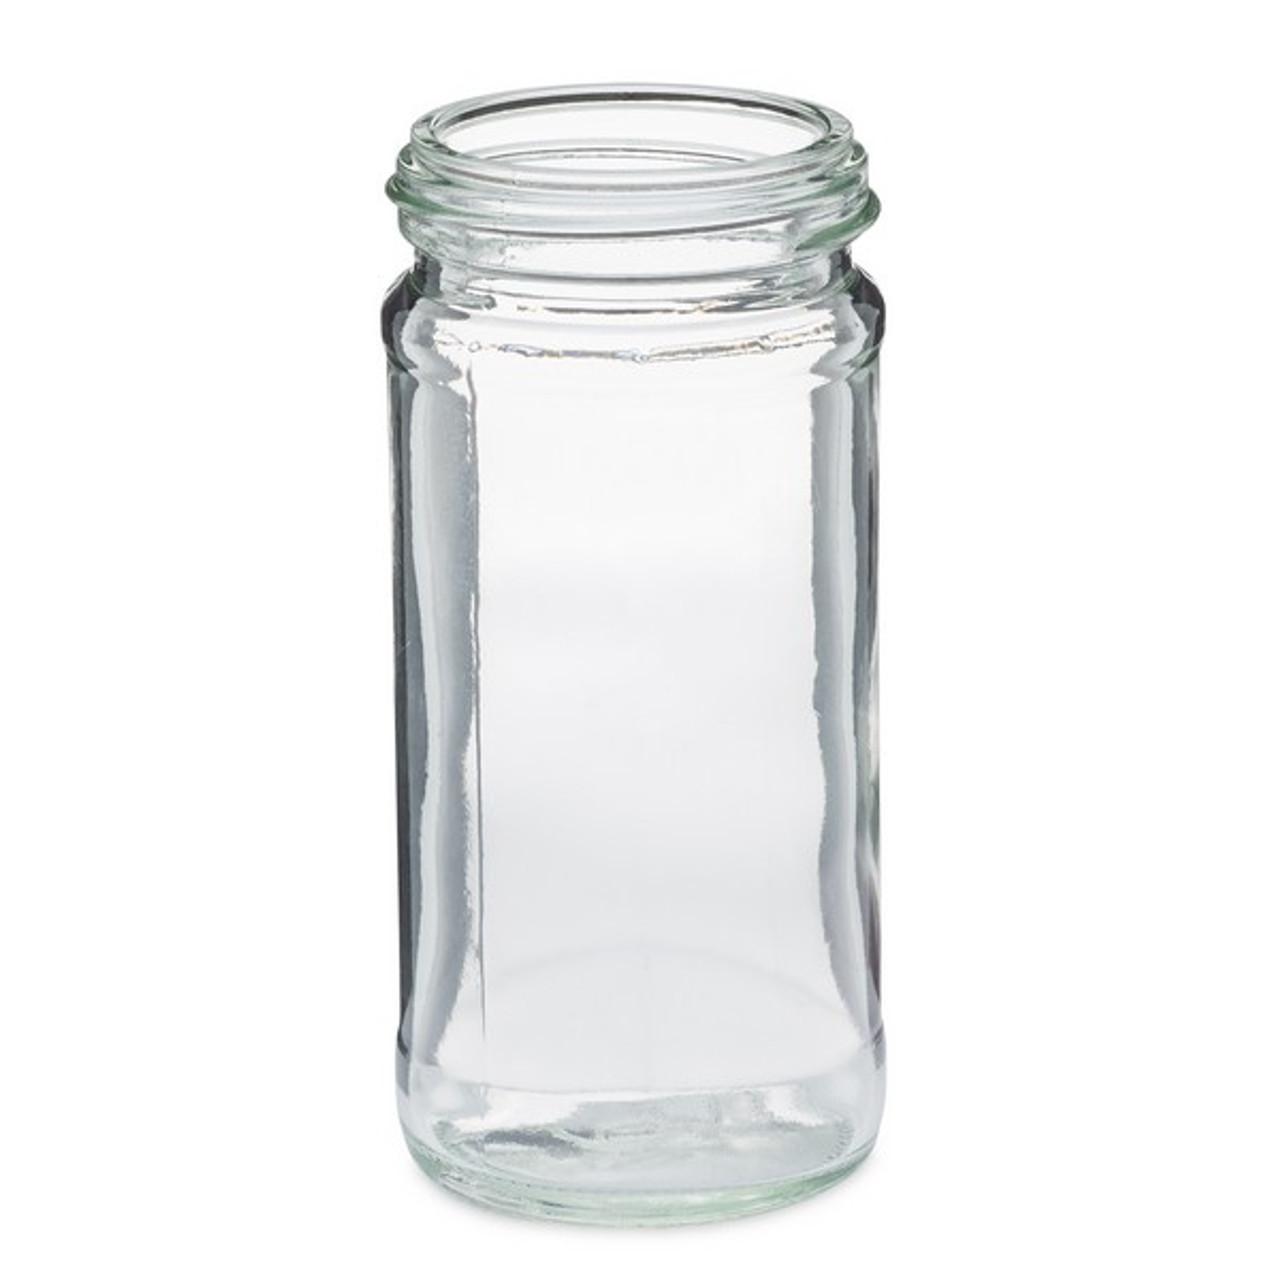 Glass Paragon Spice Jar Wholesale Amp Bulk Freund Container